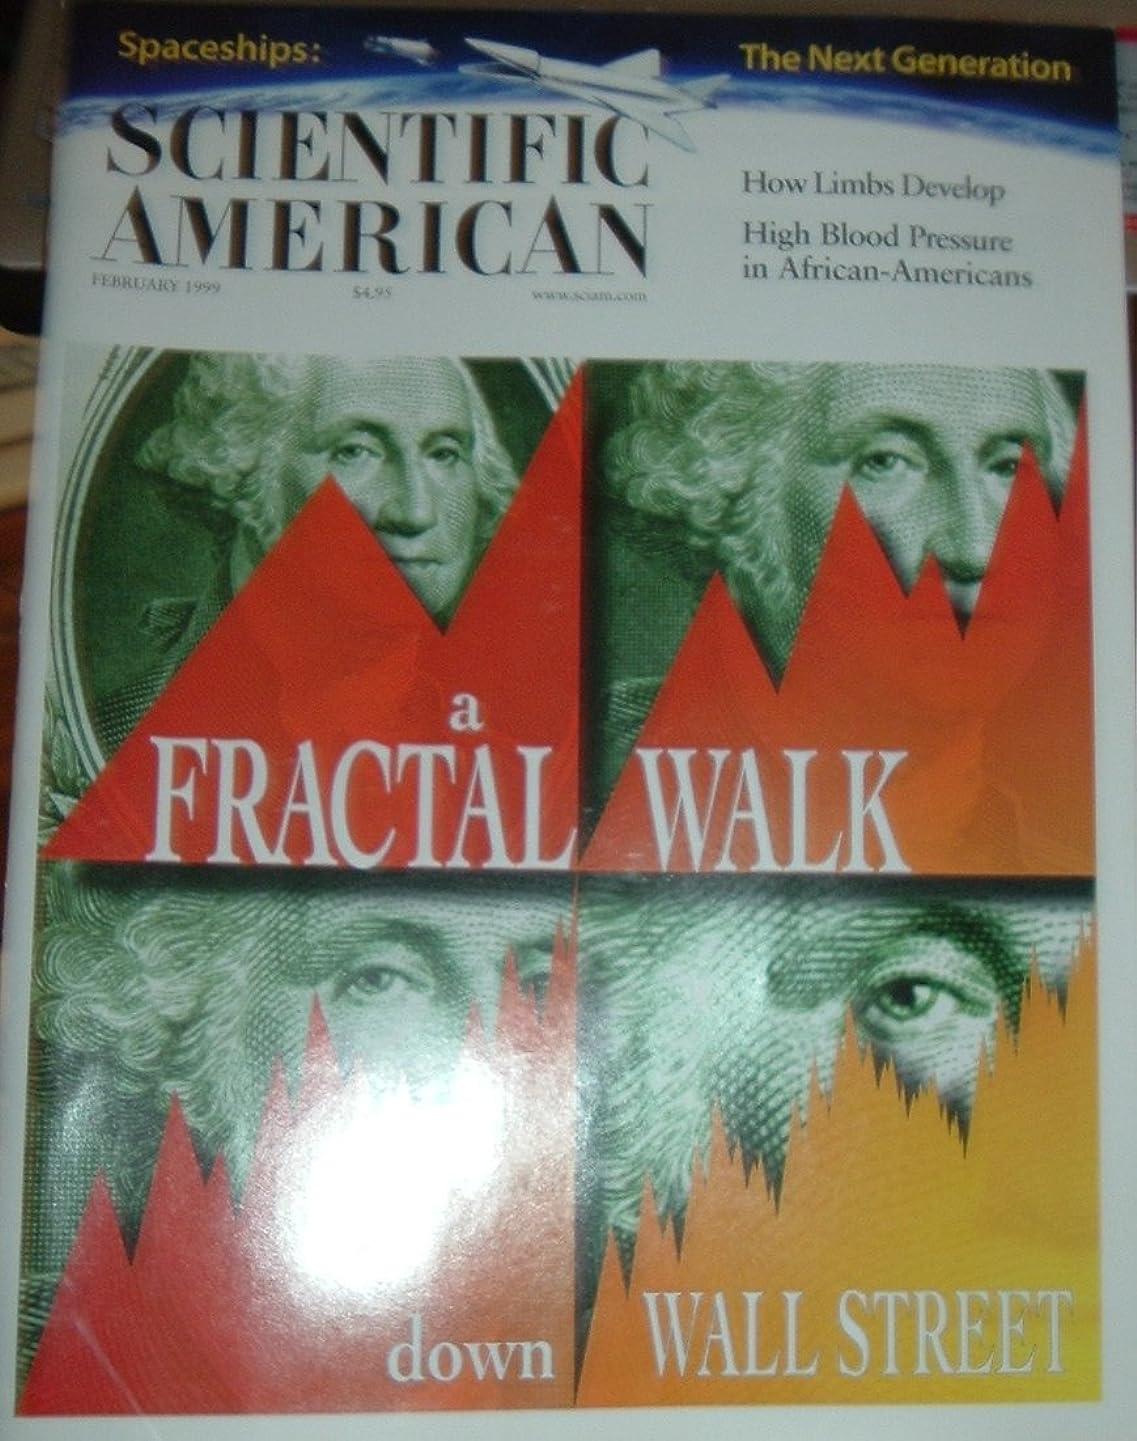 SCIENTIFIC AMERICAN February 1999 Volume 280 Number 2 (Magazine. Wall Street. High Blood Pressure In African Americans. Fractal Walk..)